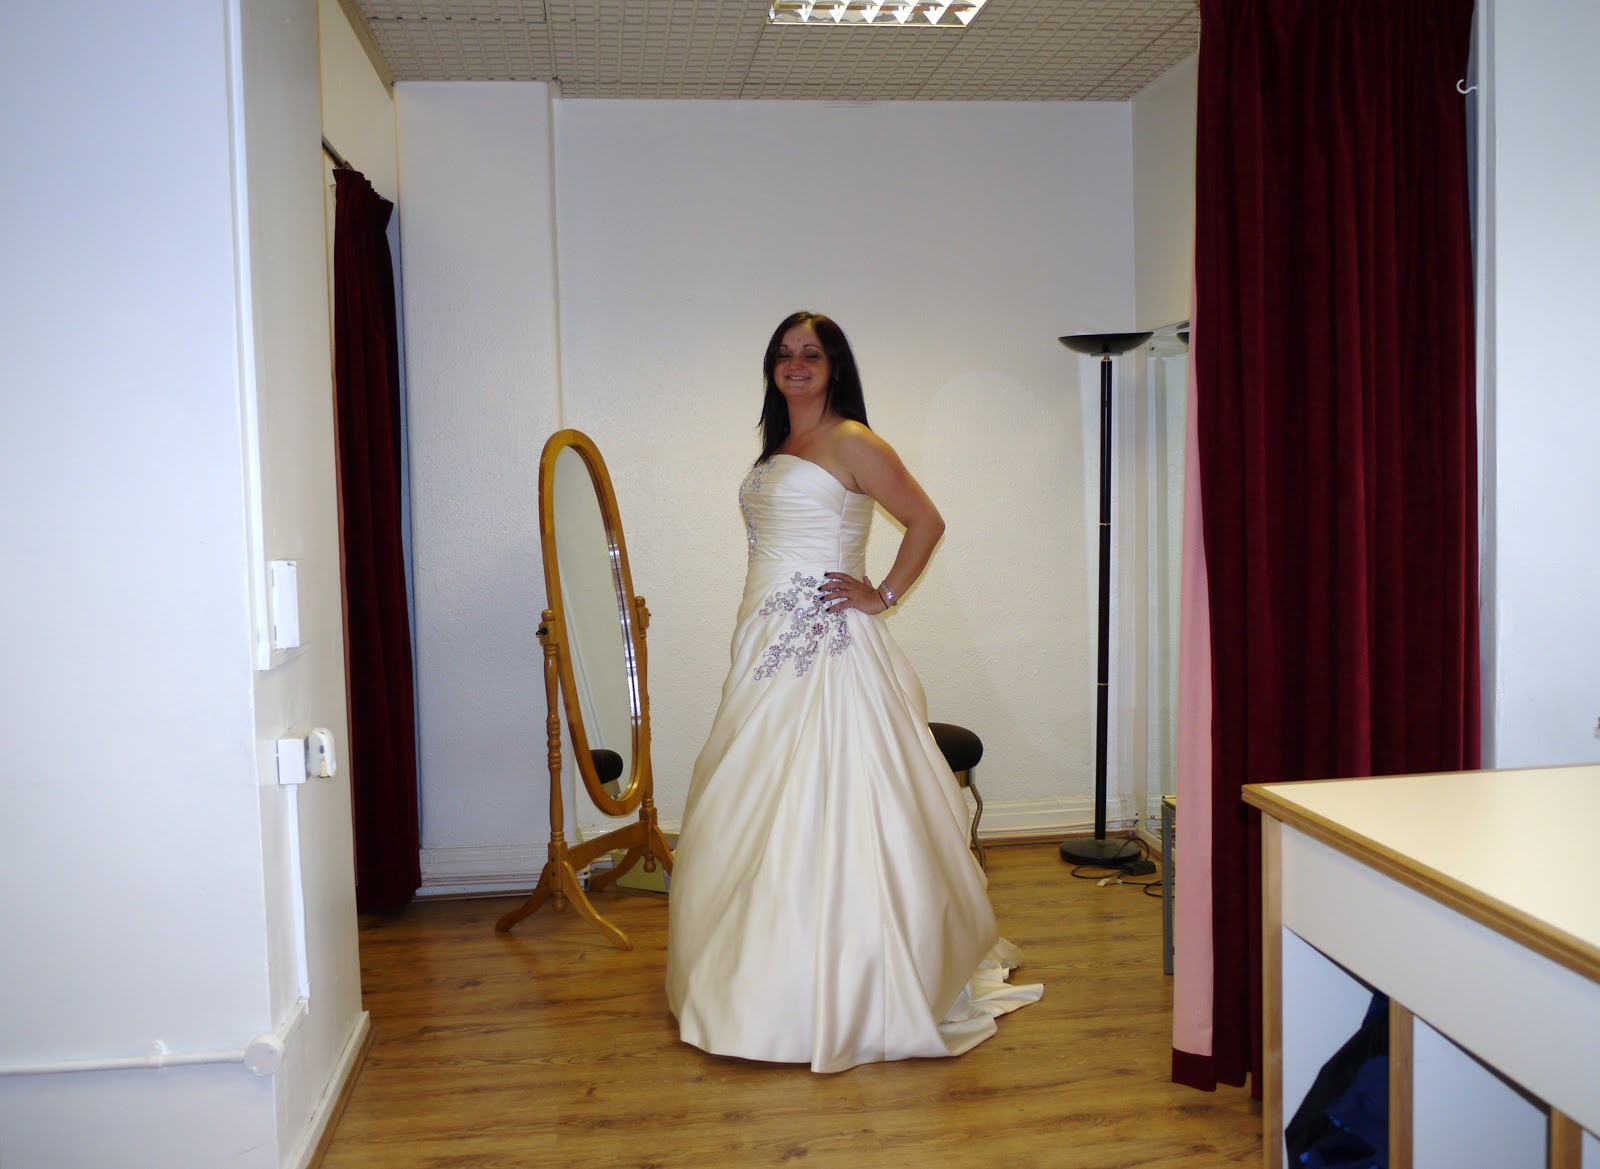 Magic Stitches: Wedding Dresses And Bridal Alteration